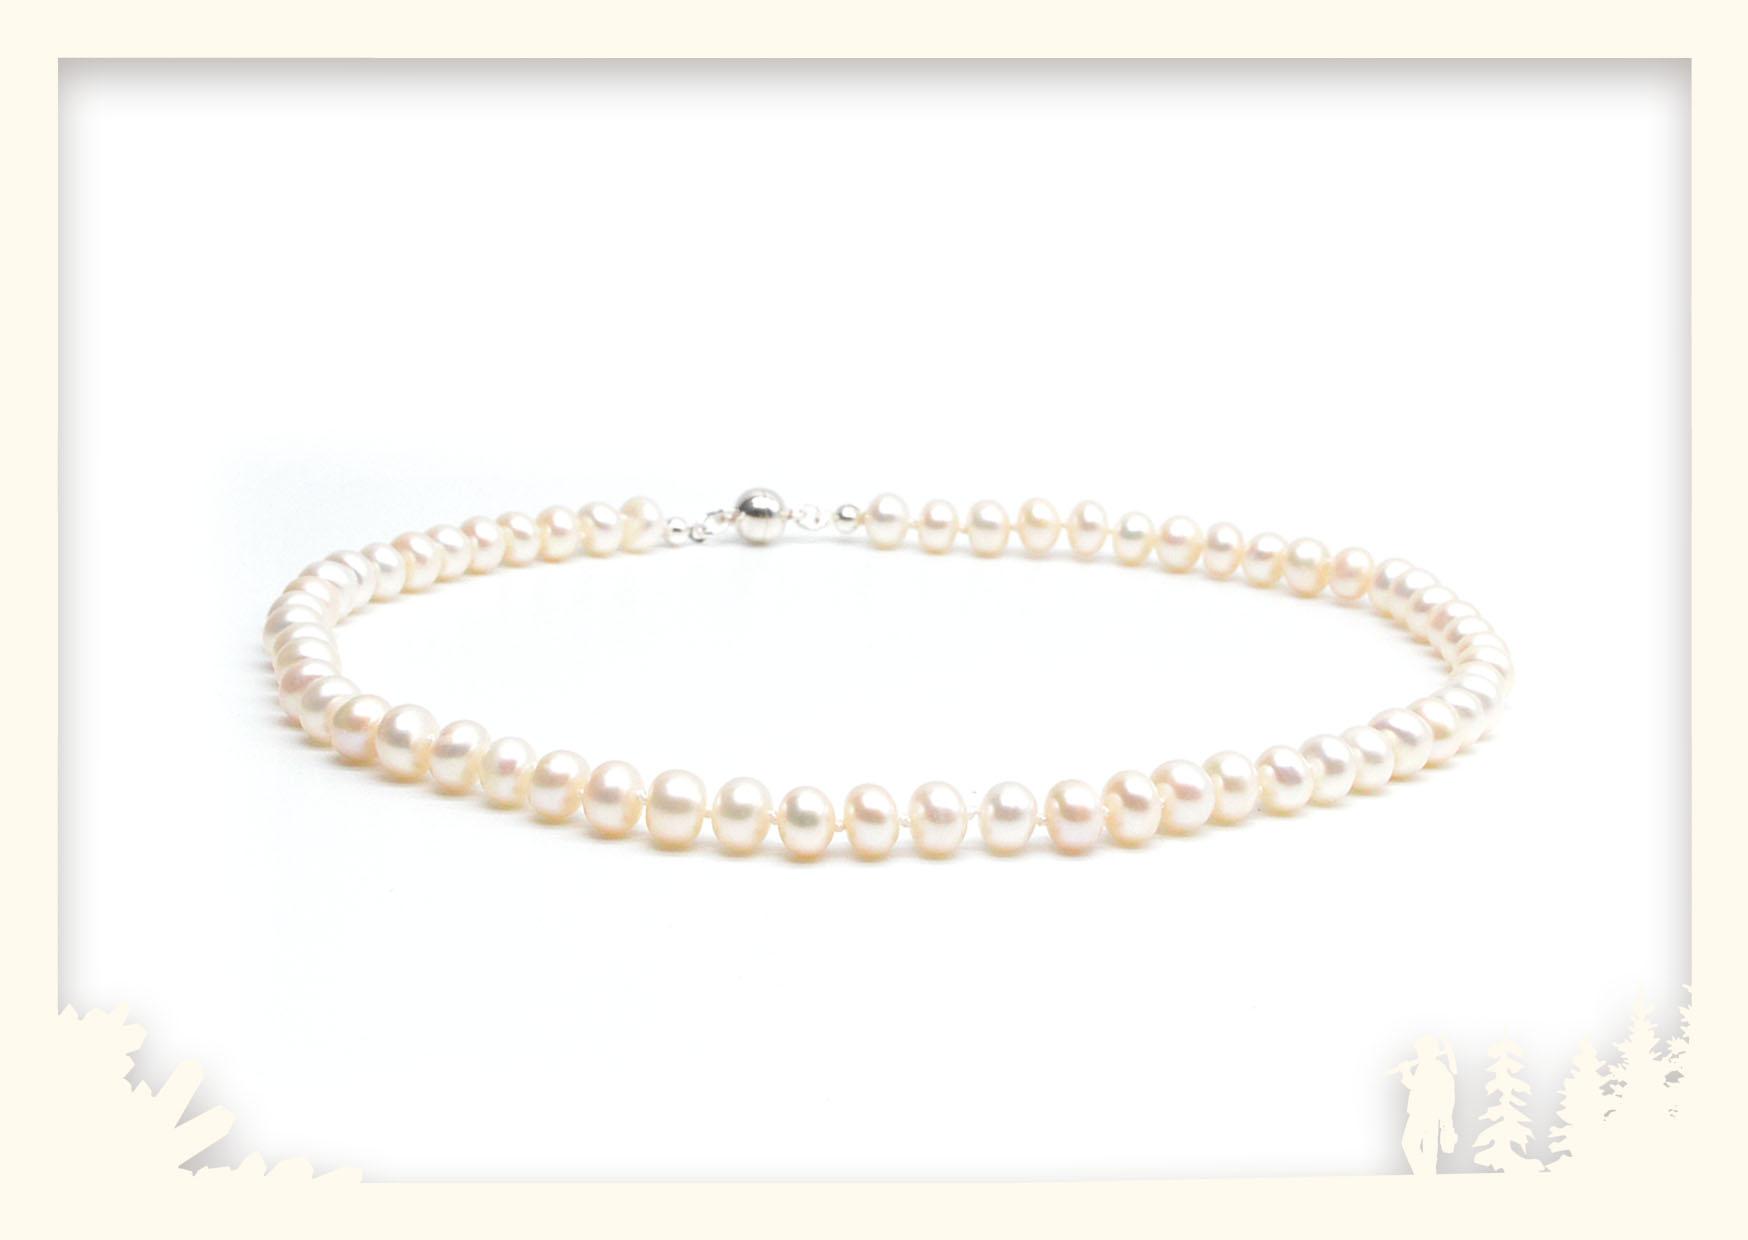 Perlenkette Image